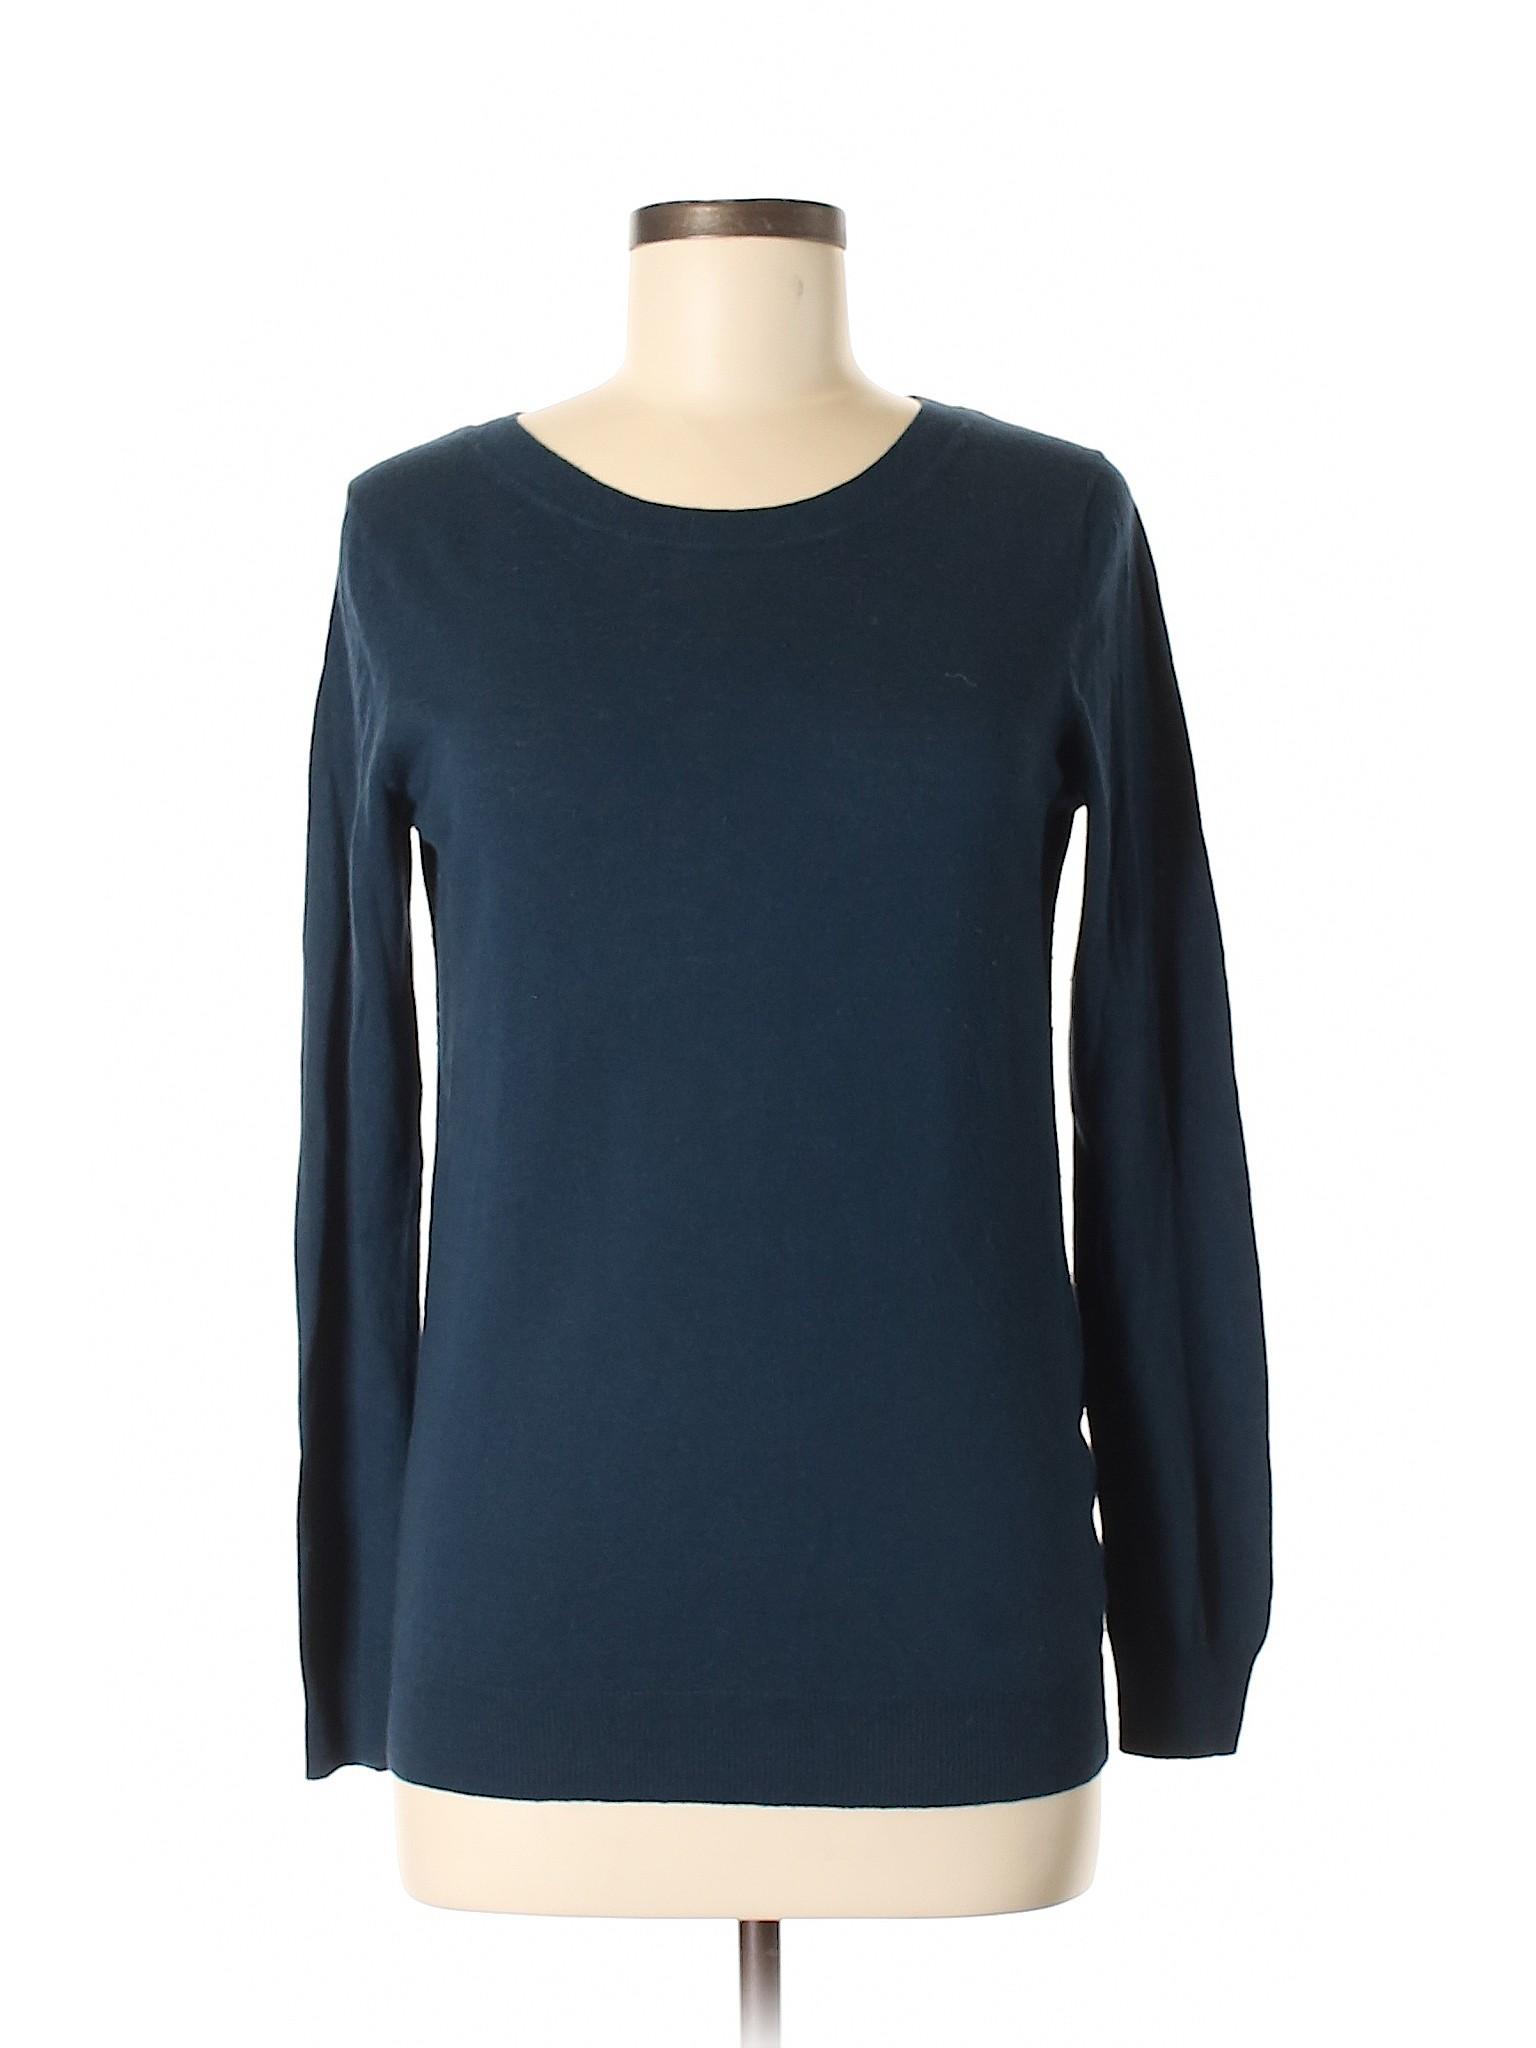 Boutique Sweater Gap Sweater Gap Sweater Sweater Pullover Pullover Gap Pullover Boutique Boutique Gap Pullover Boutique qa6H60C